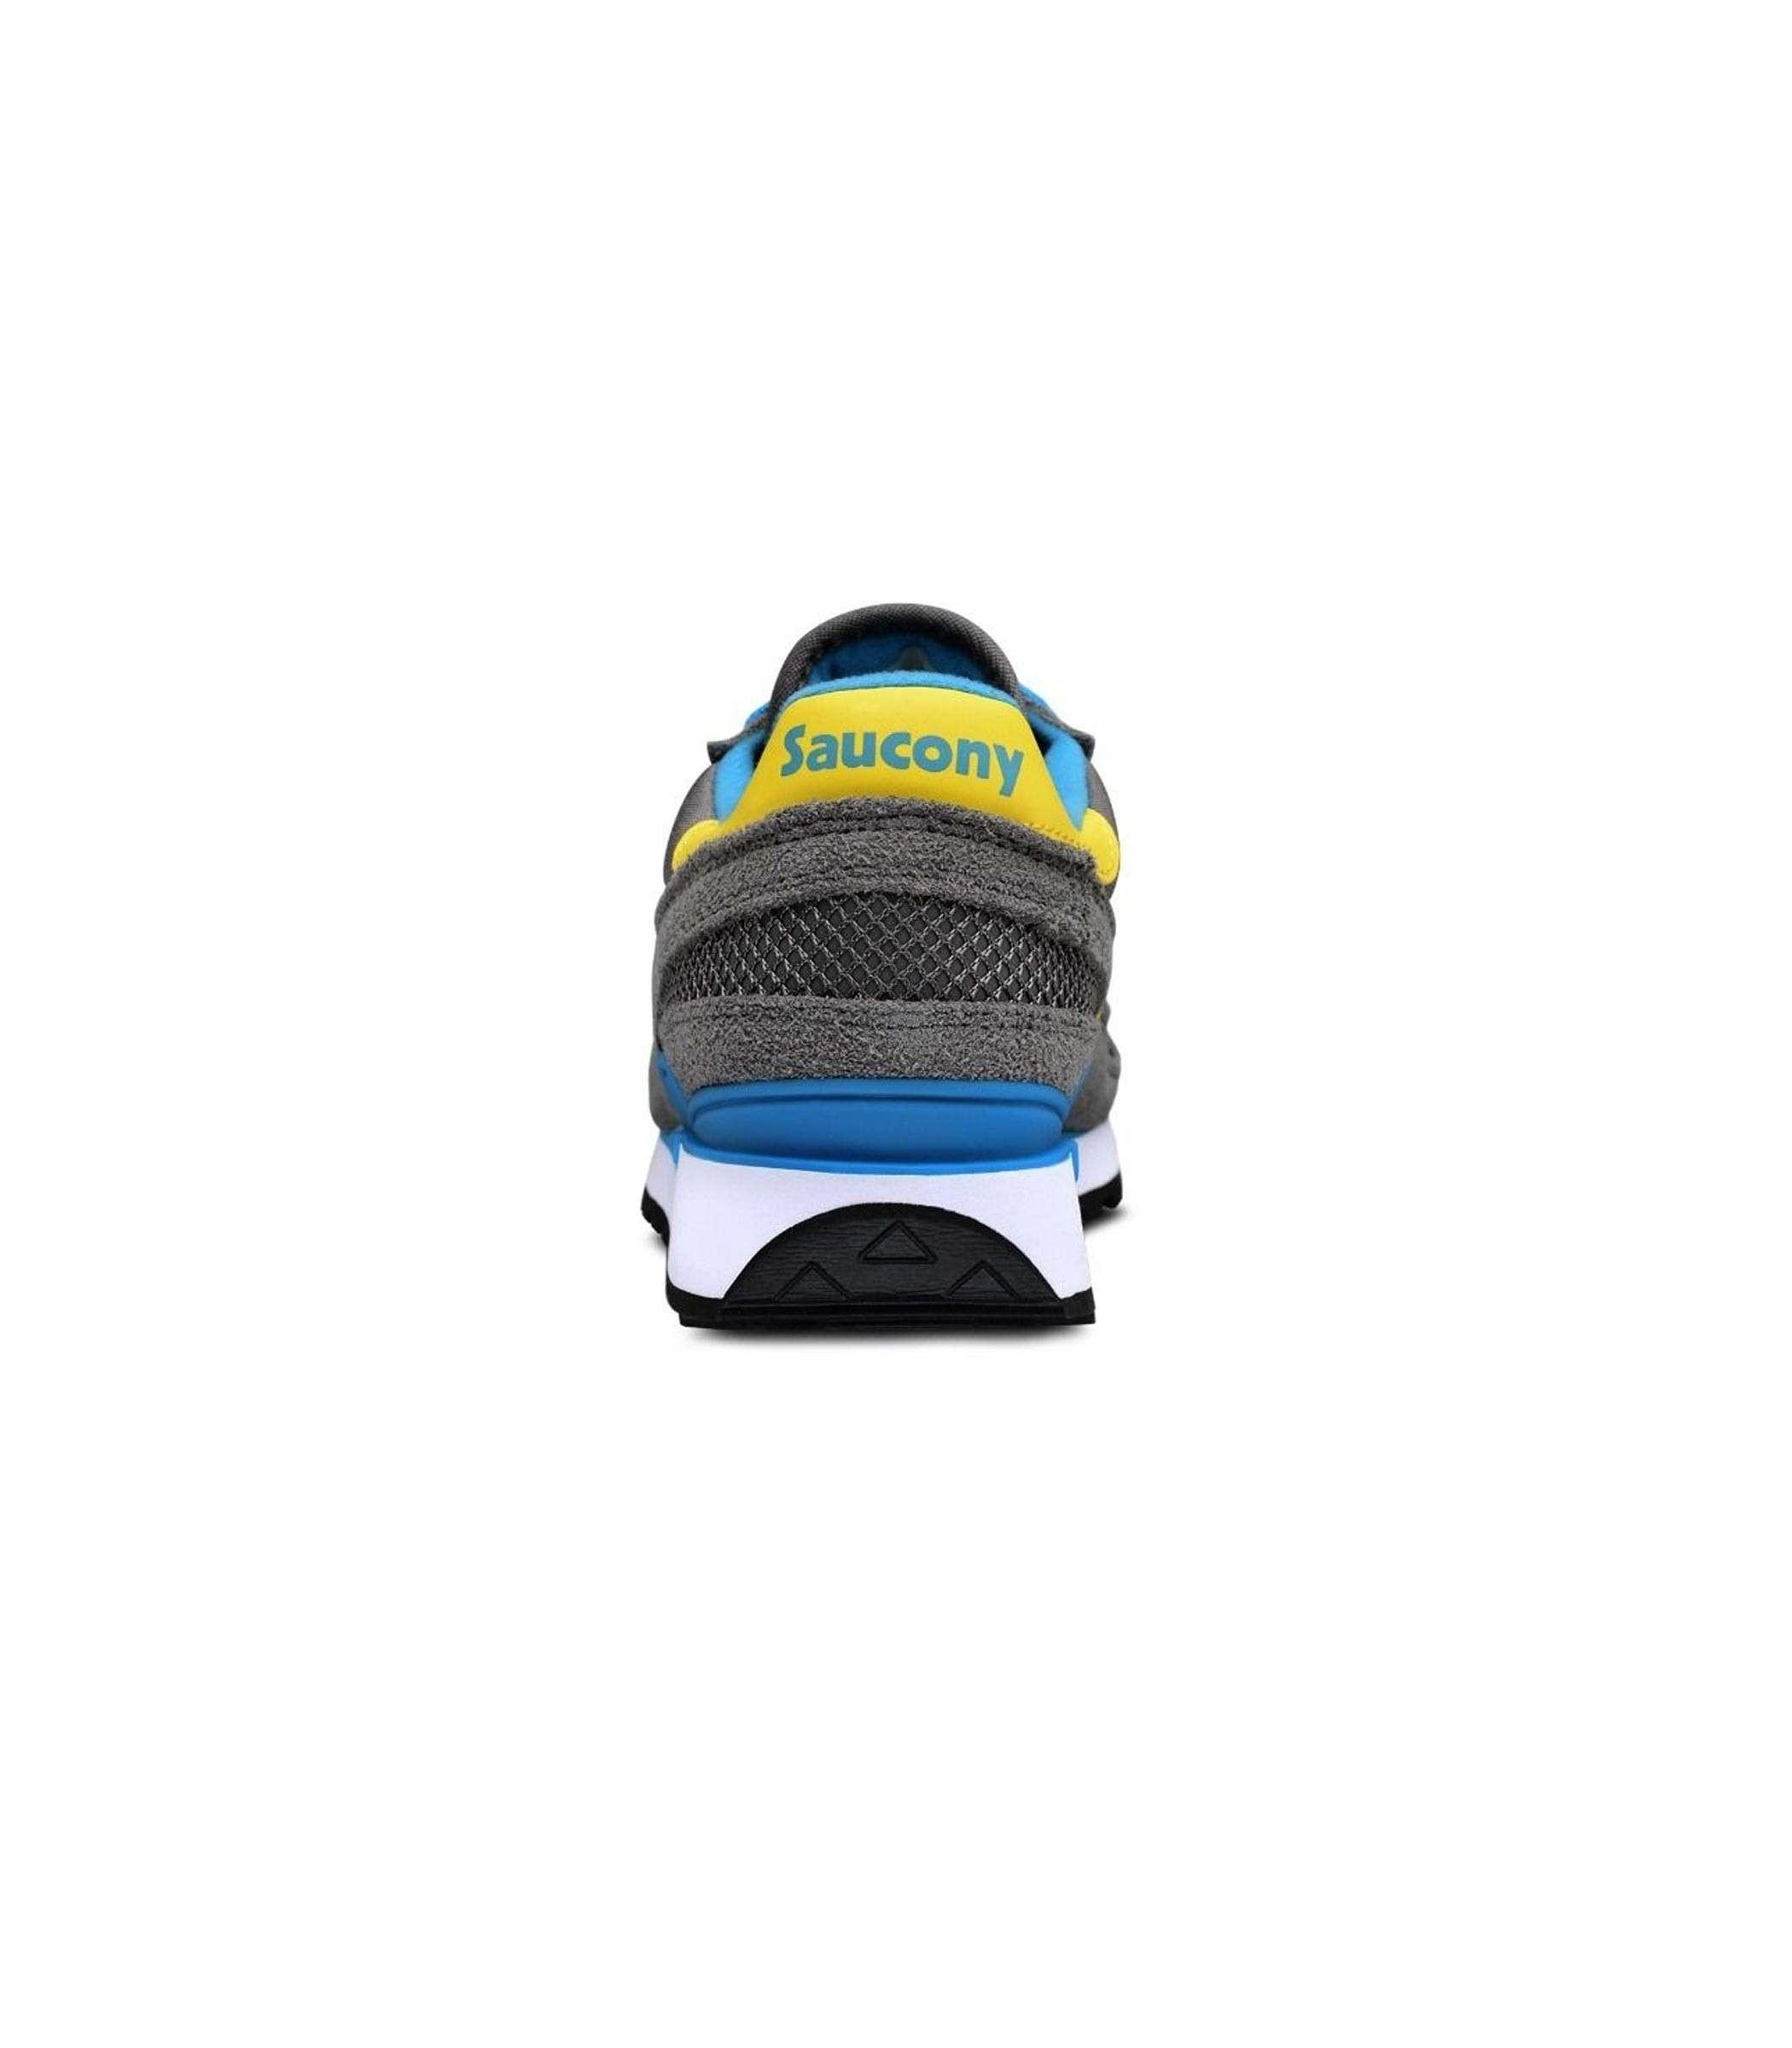 https://www.parmax.com/media/catalog/product/a/i/AI-Outlet_Parmax-Sneackers-Saucony-S2108-535-C.jpg